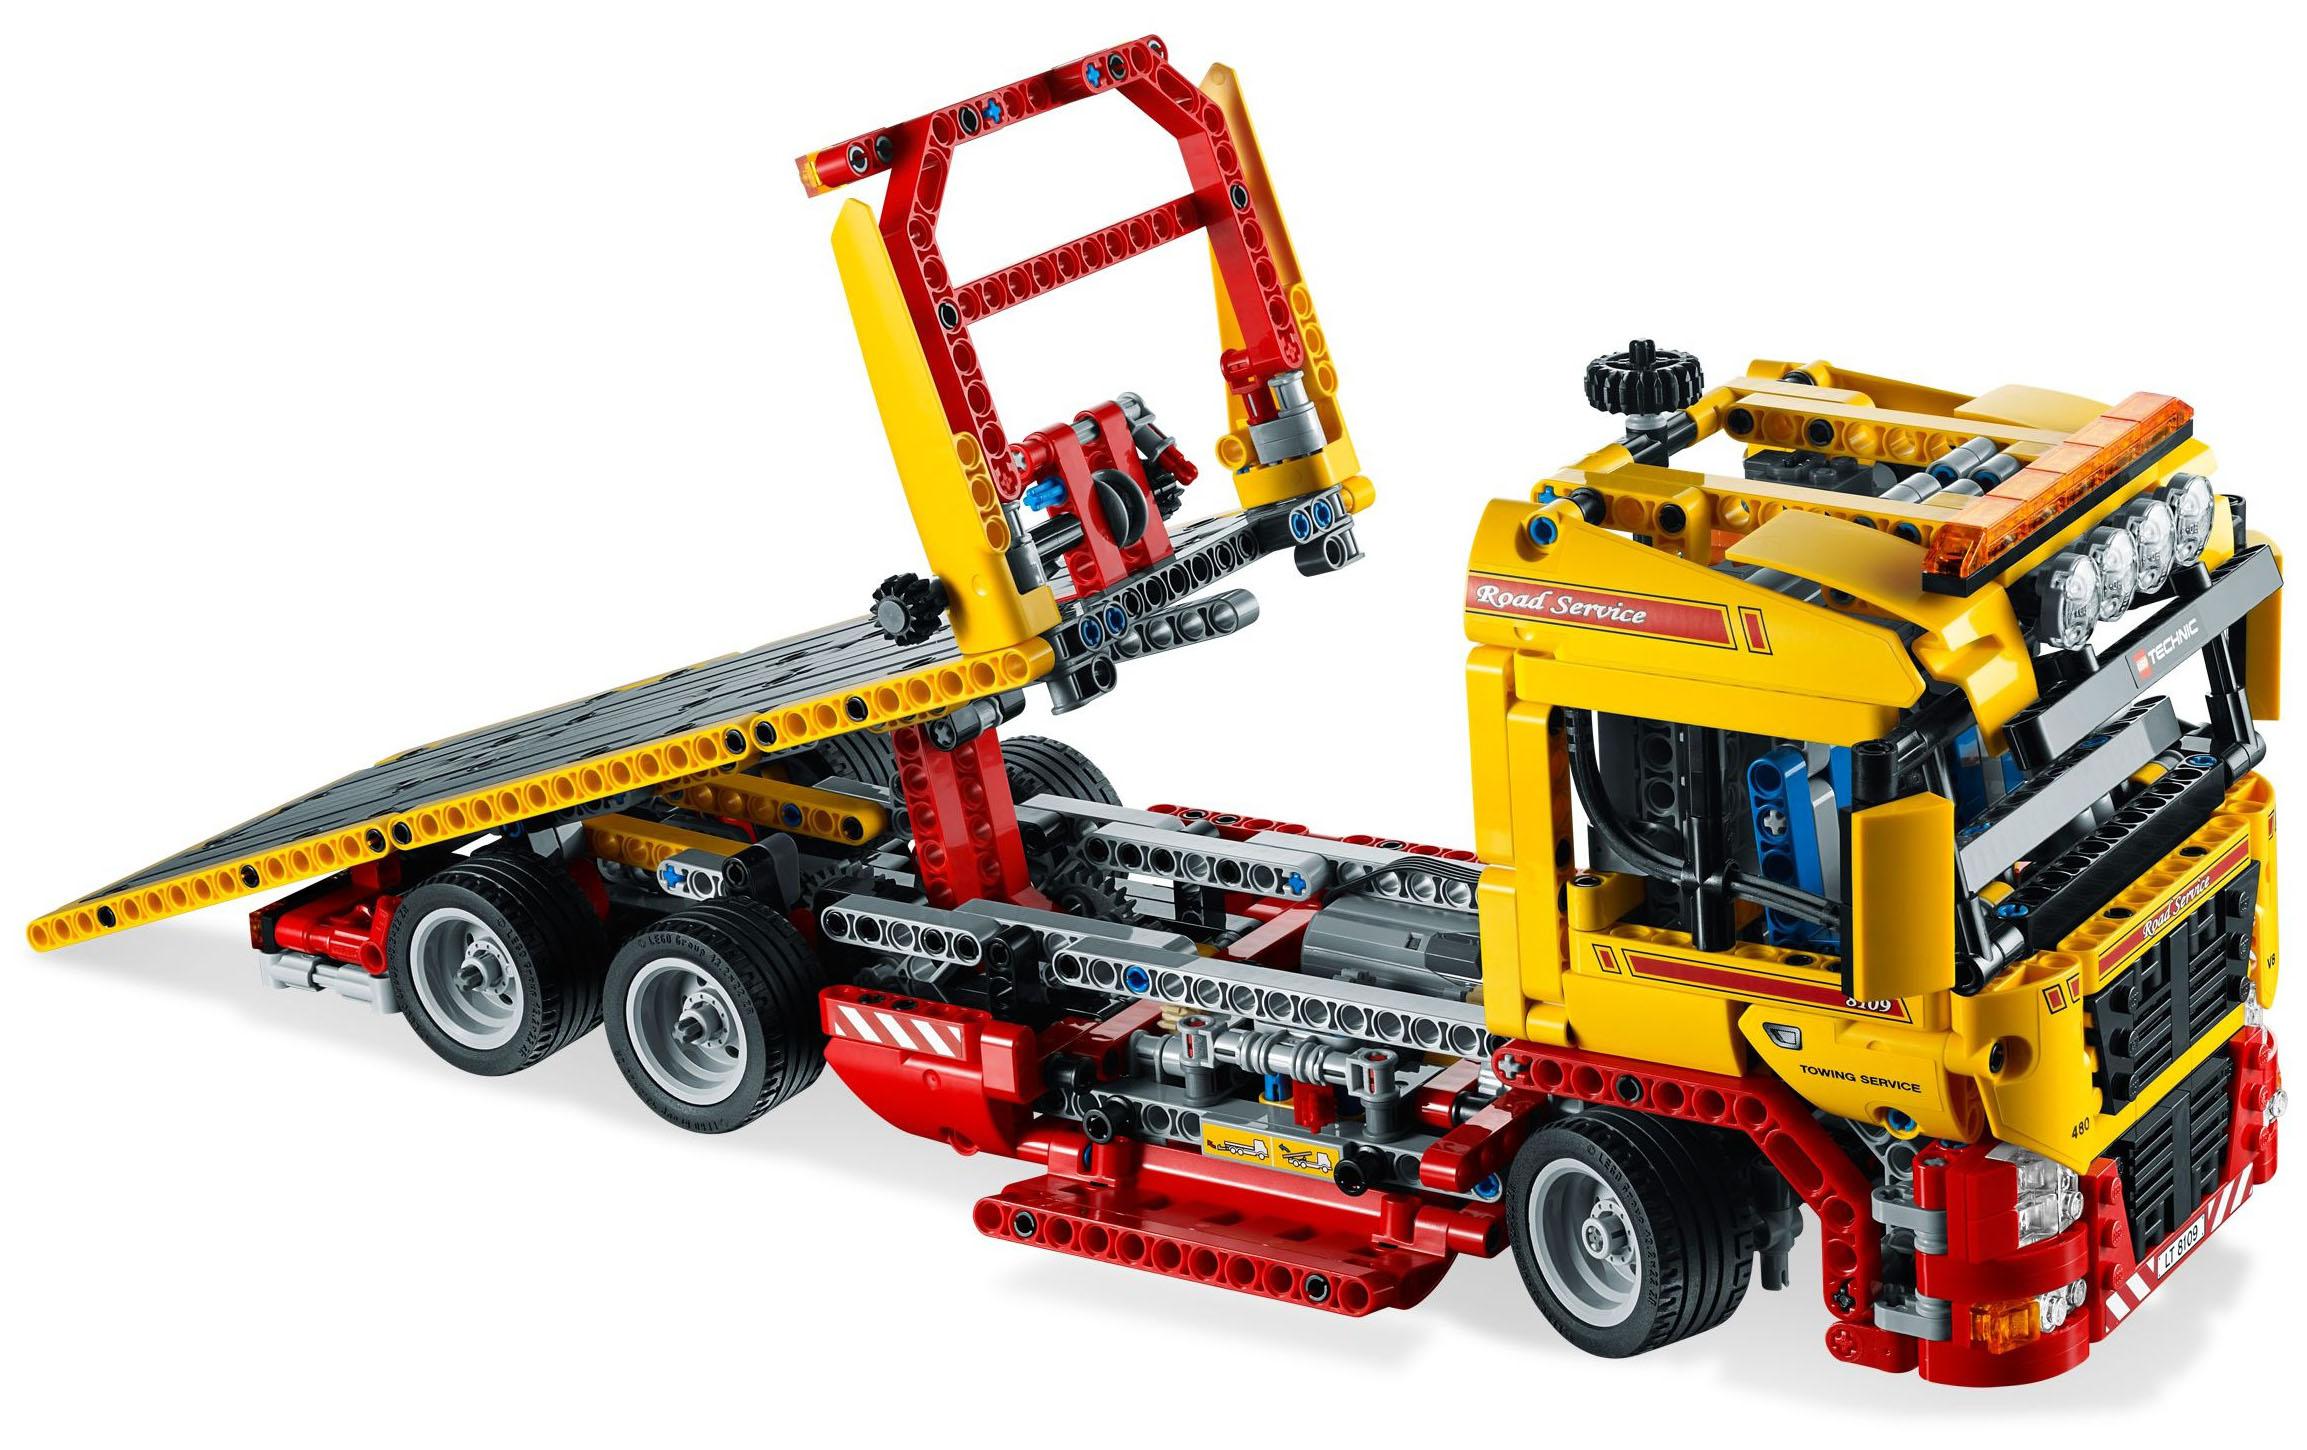 lego technic 8109 pas cher le camion remorque. Black Bedroom Furniture Sets. Home Design Ideas